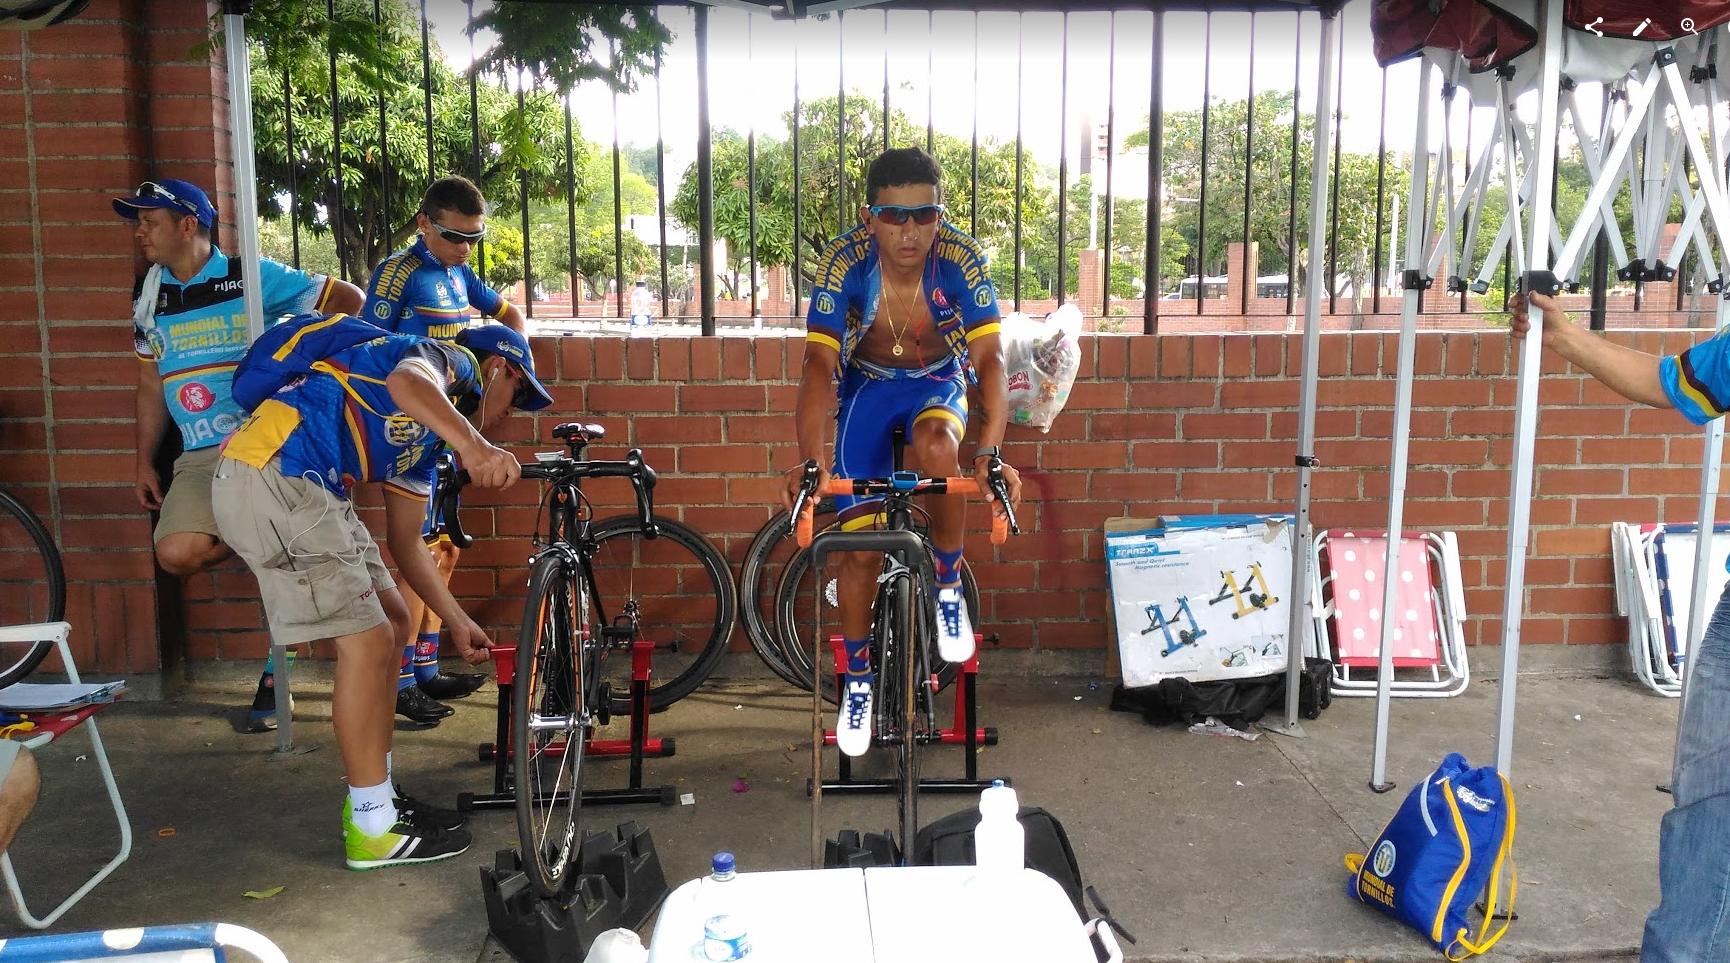 Vuelta a Colombia 2016 - Página 2 606e70f92d834d0c8a1e4c51afaa18c1